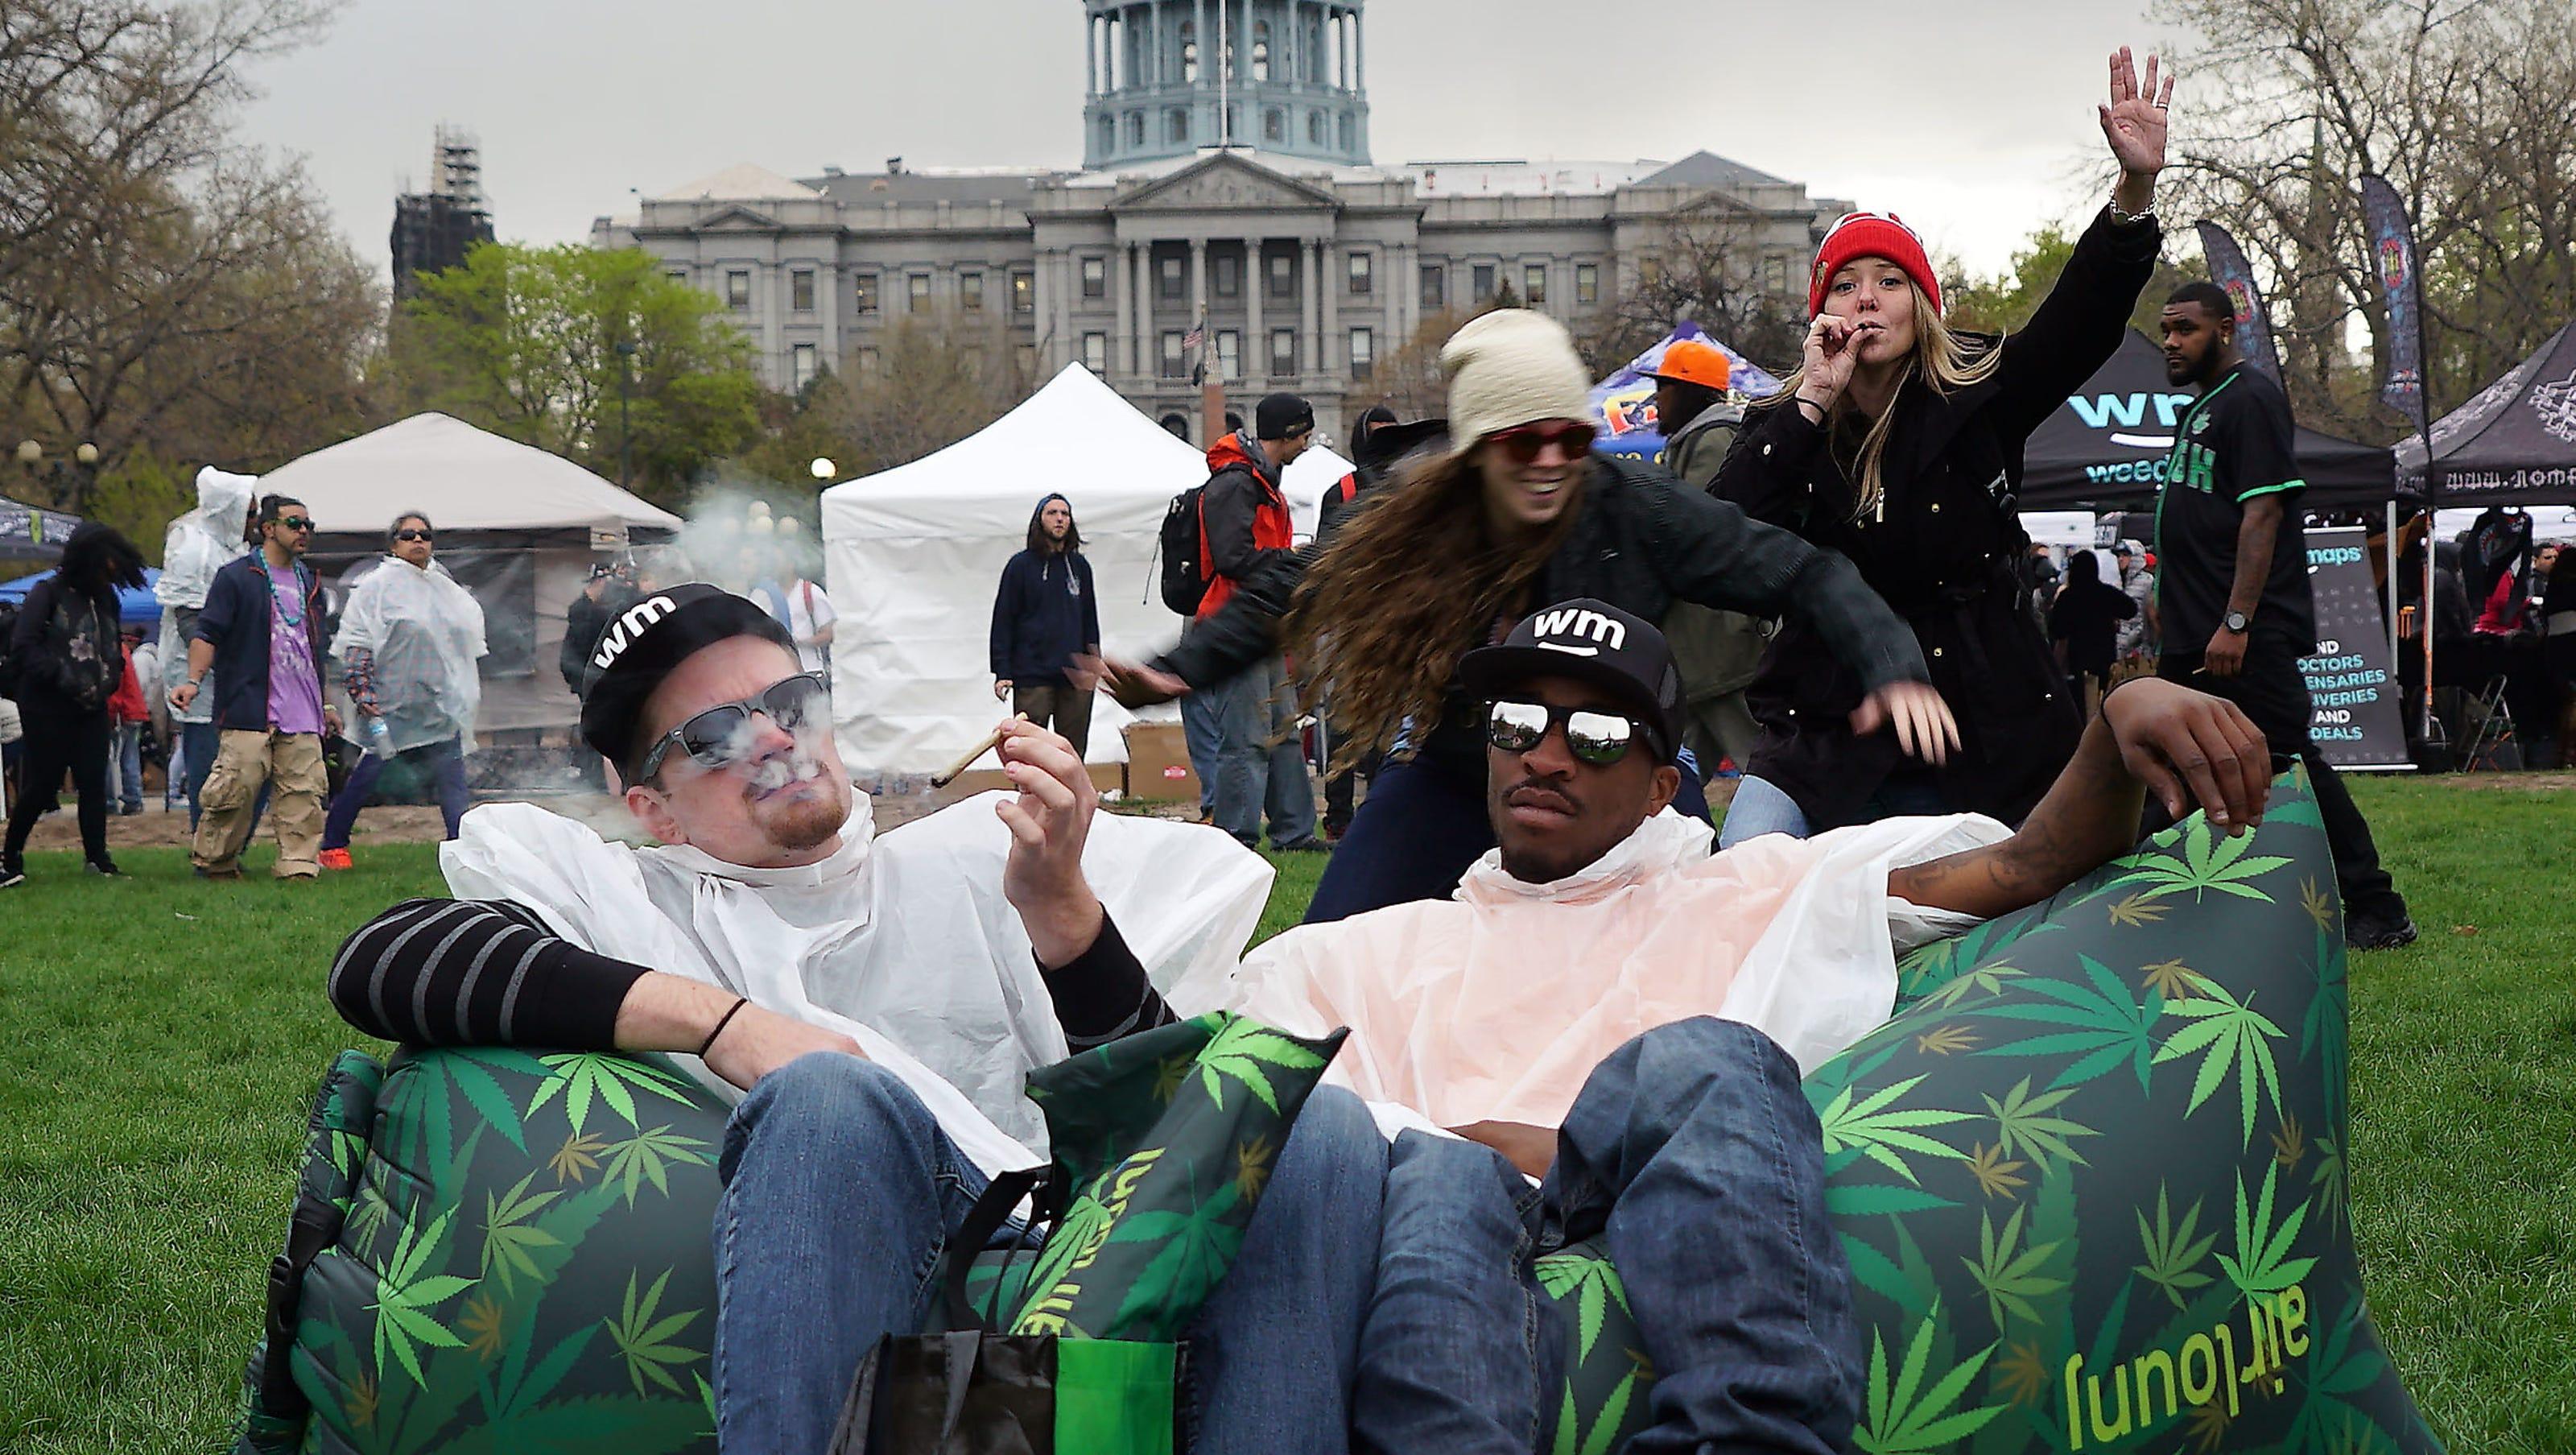 https://eu.usatoday.com/story/news/2018/04/18/420-bringing-massive-marijuana-party-denver-nations-largest-public-light-up/521371002/